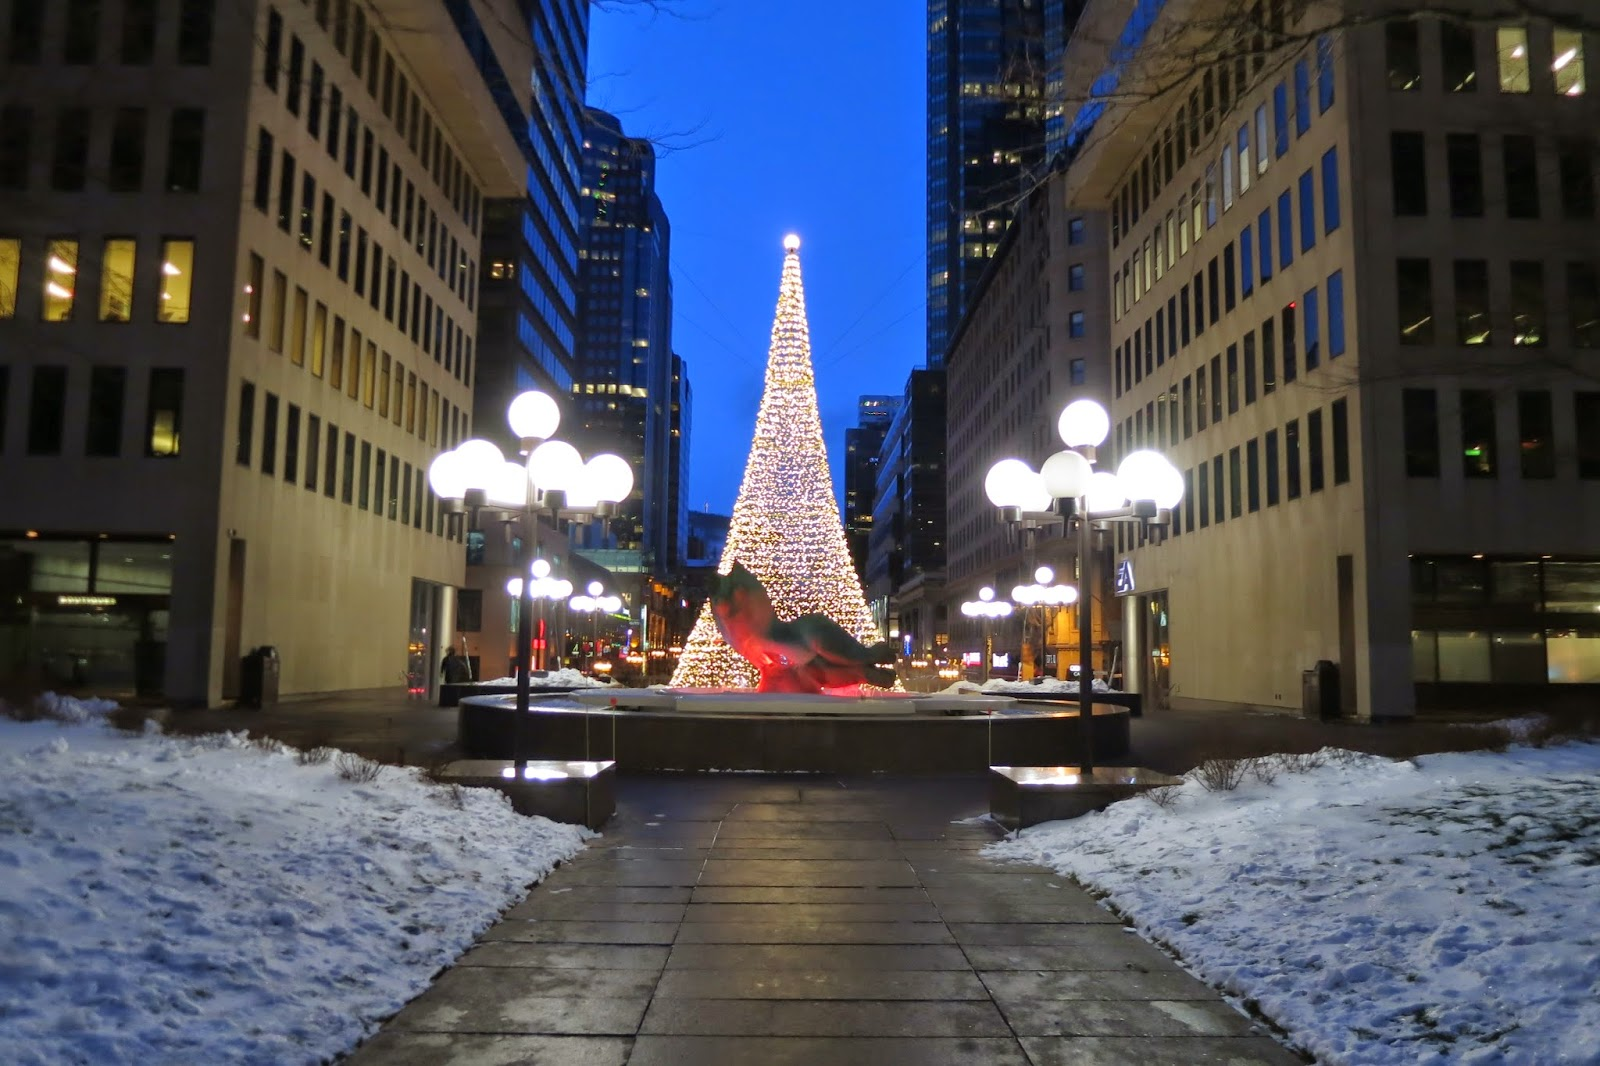 Tree of light between office buildings